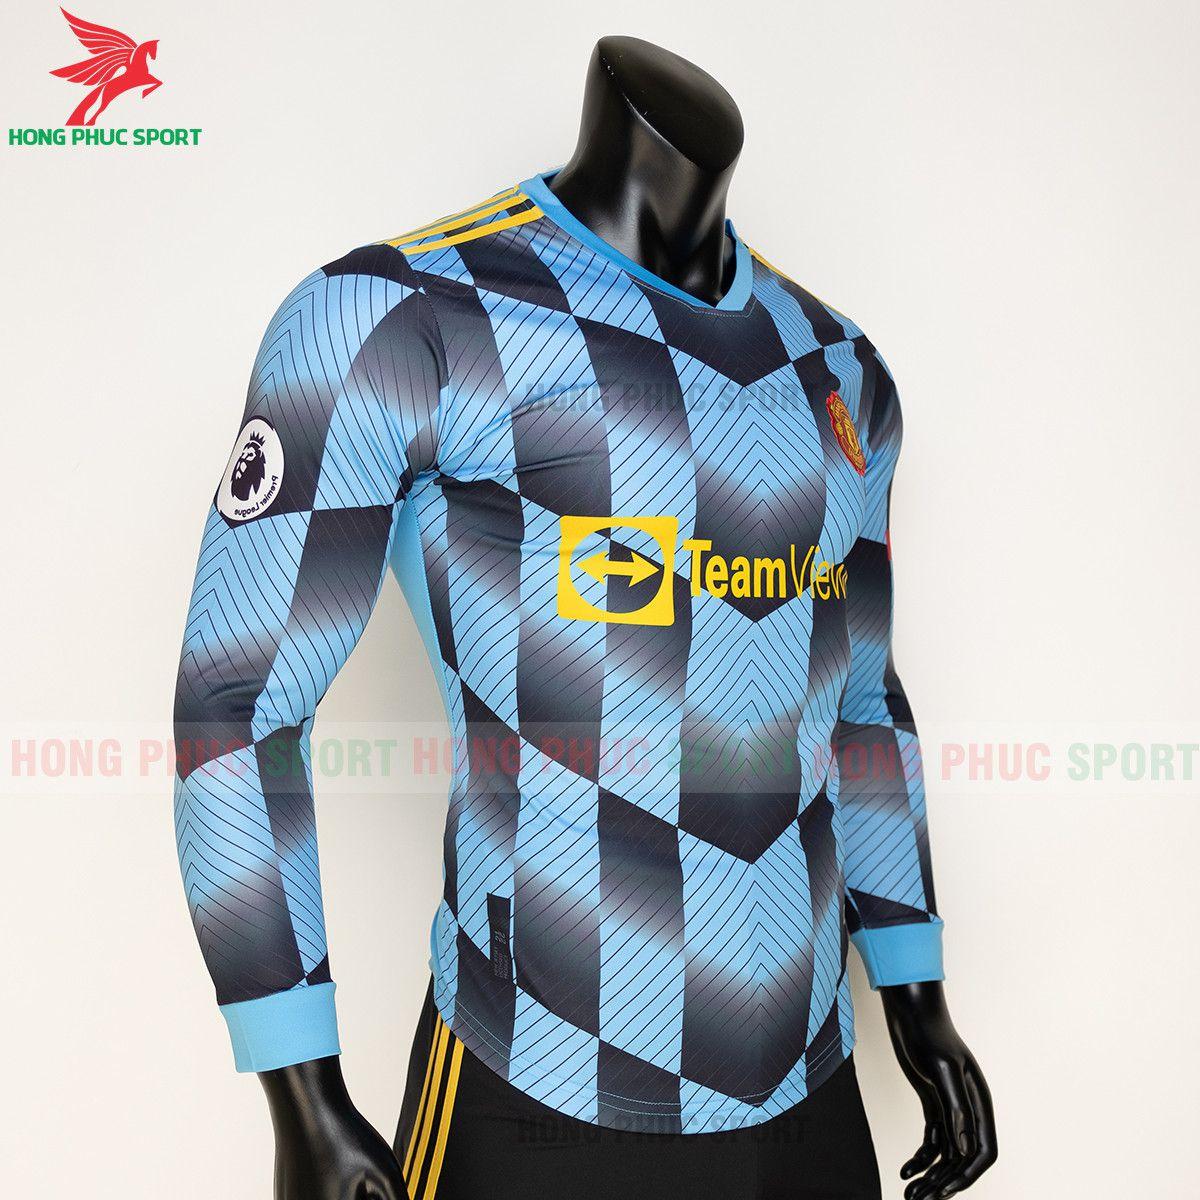 https://cdn.hongphucsport.com/unsafe/s4.shopbay.vn/files/285/ao-bong-da-mu-dai-tay-2021-22-mau-thu-3-thun-lanh-5-615d5b0800ff4.jpg